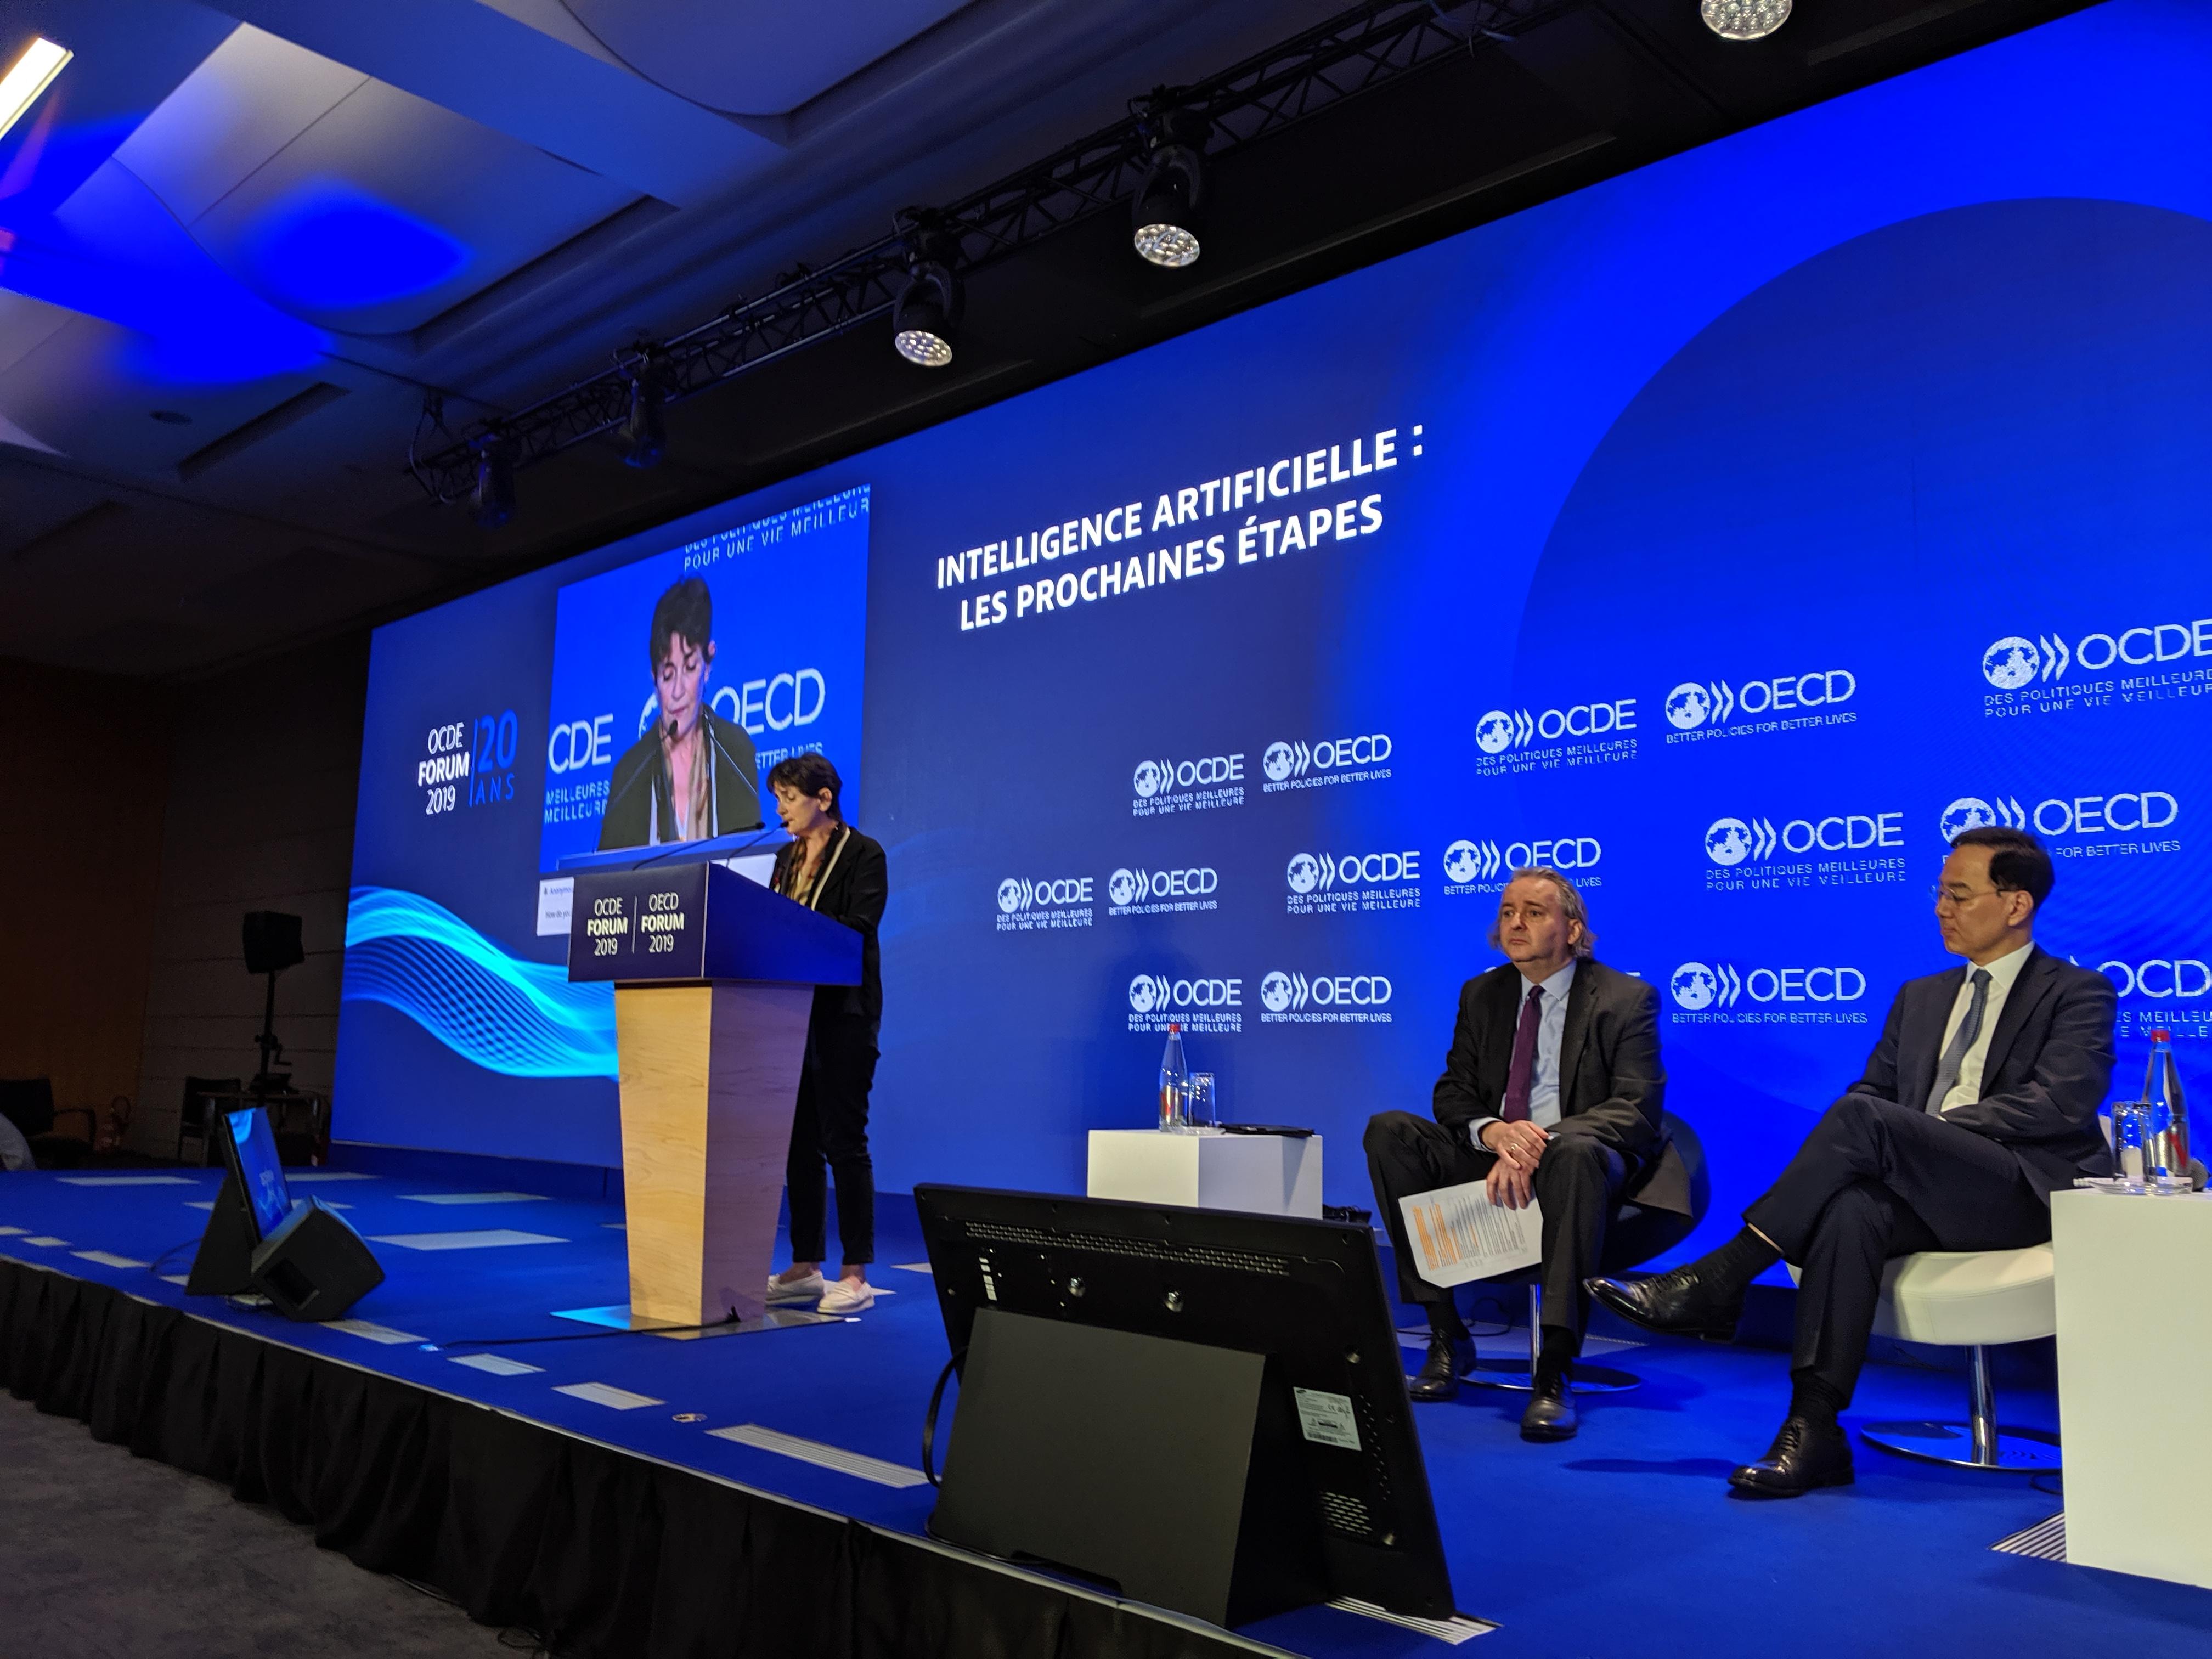 HumaneAI partners contribute to OECD AI principles